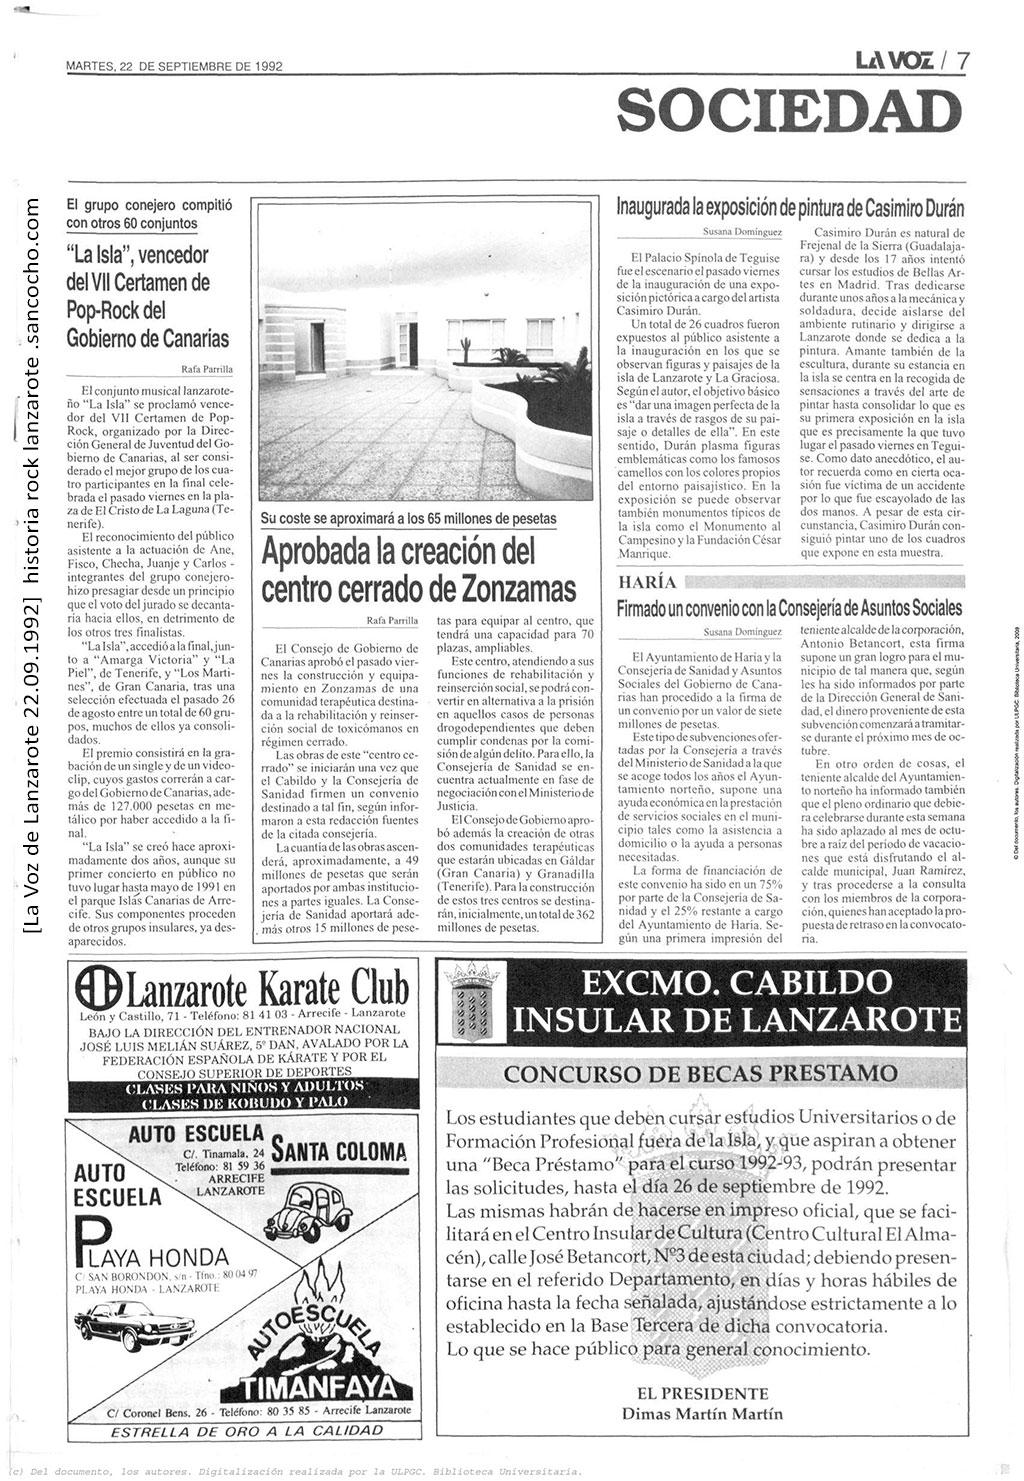 La-Voz-de-Lanzarote-22091992-La-Isla